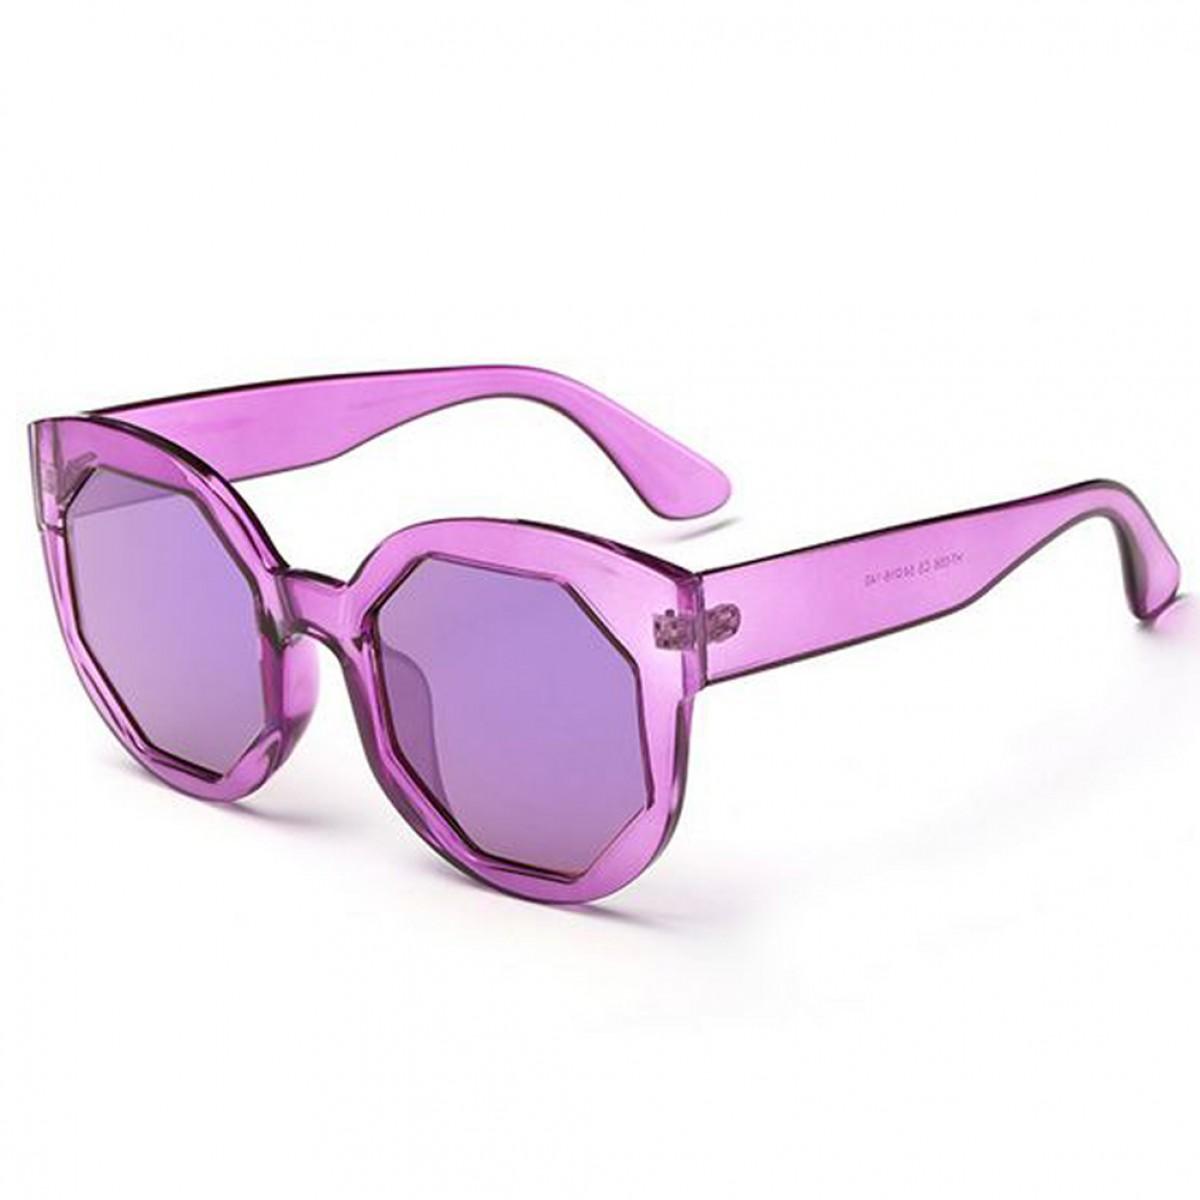 funky sunglasses xlhx  funky sunglasses